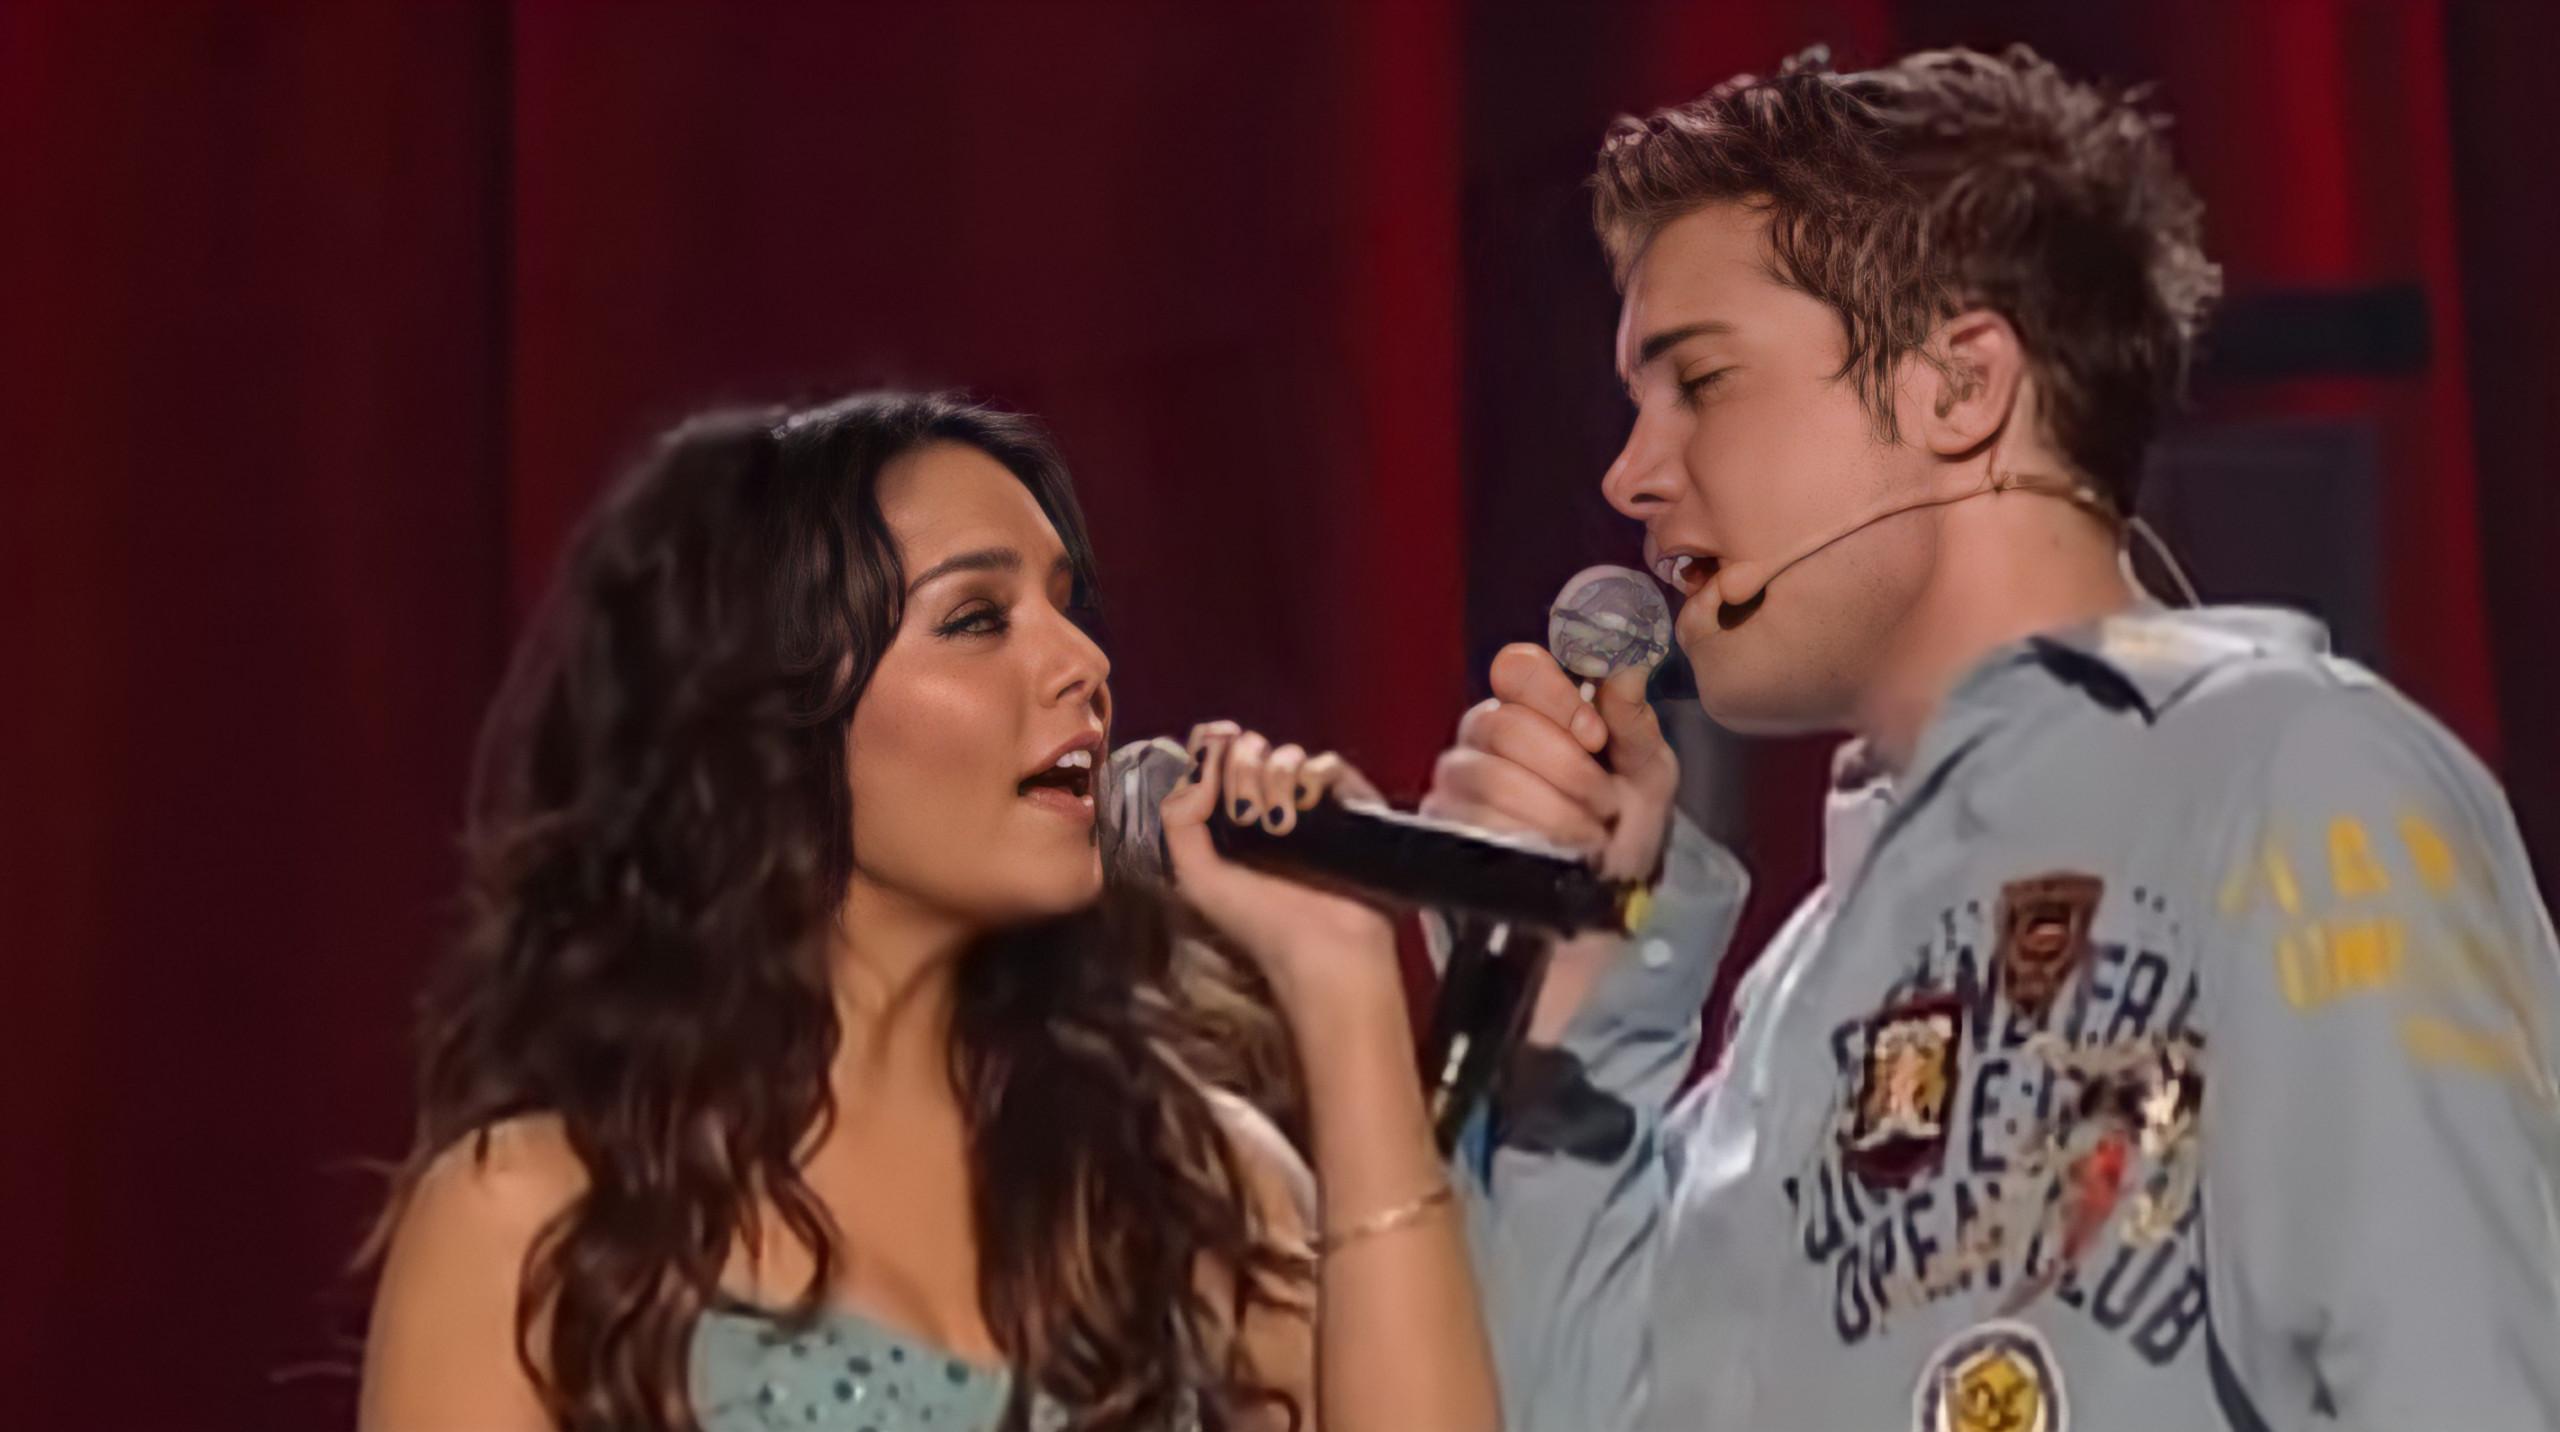 Drew Seeley and Vanessa Hudgens singing